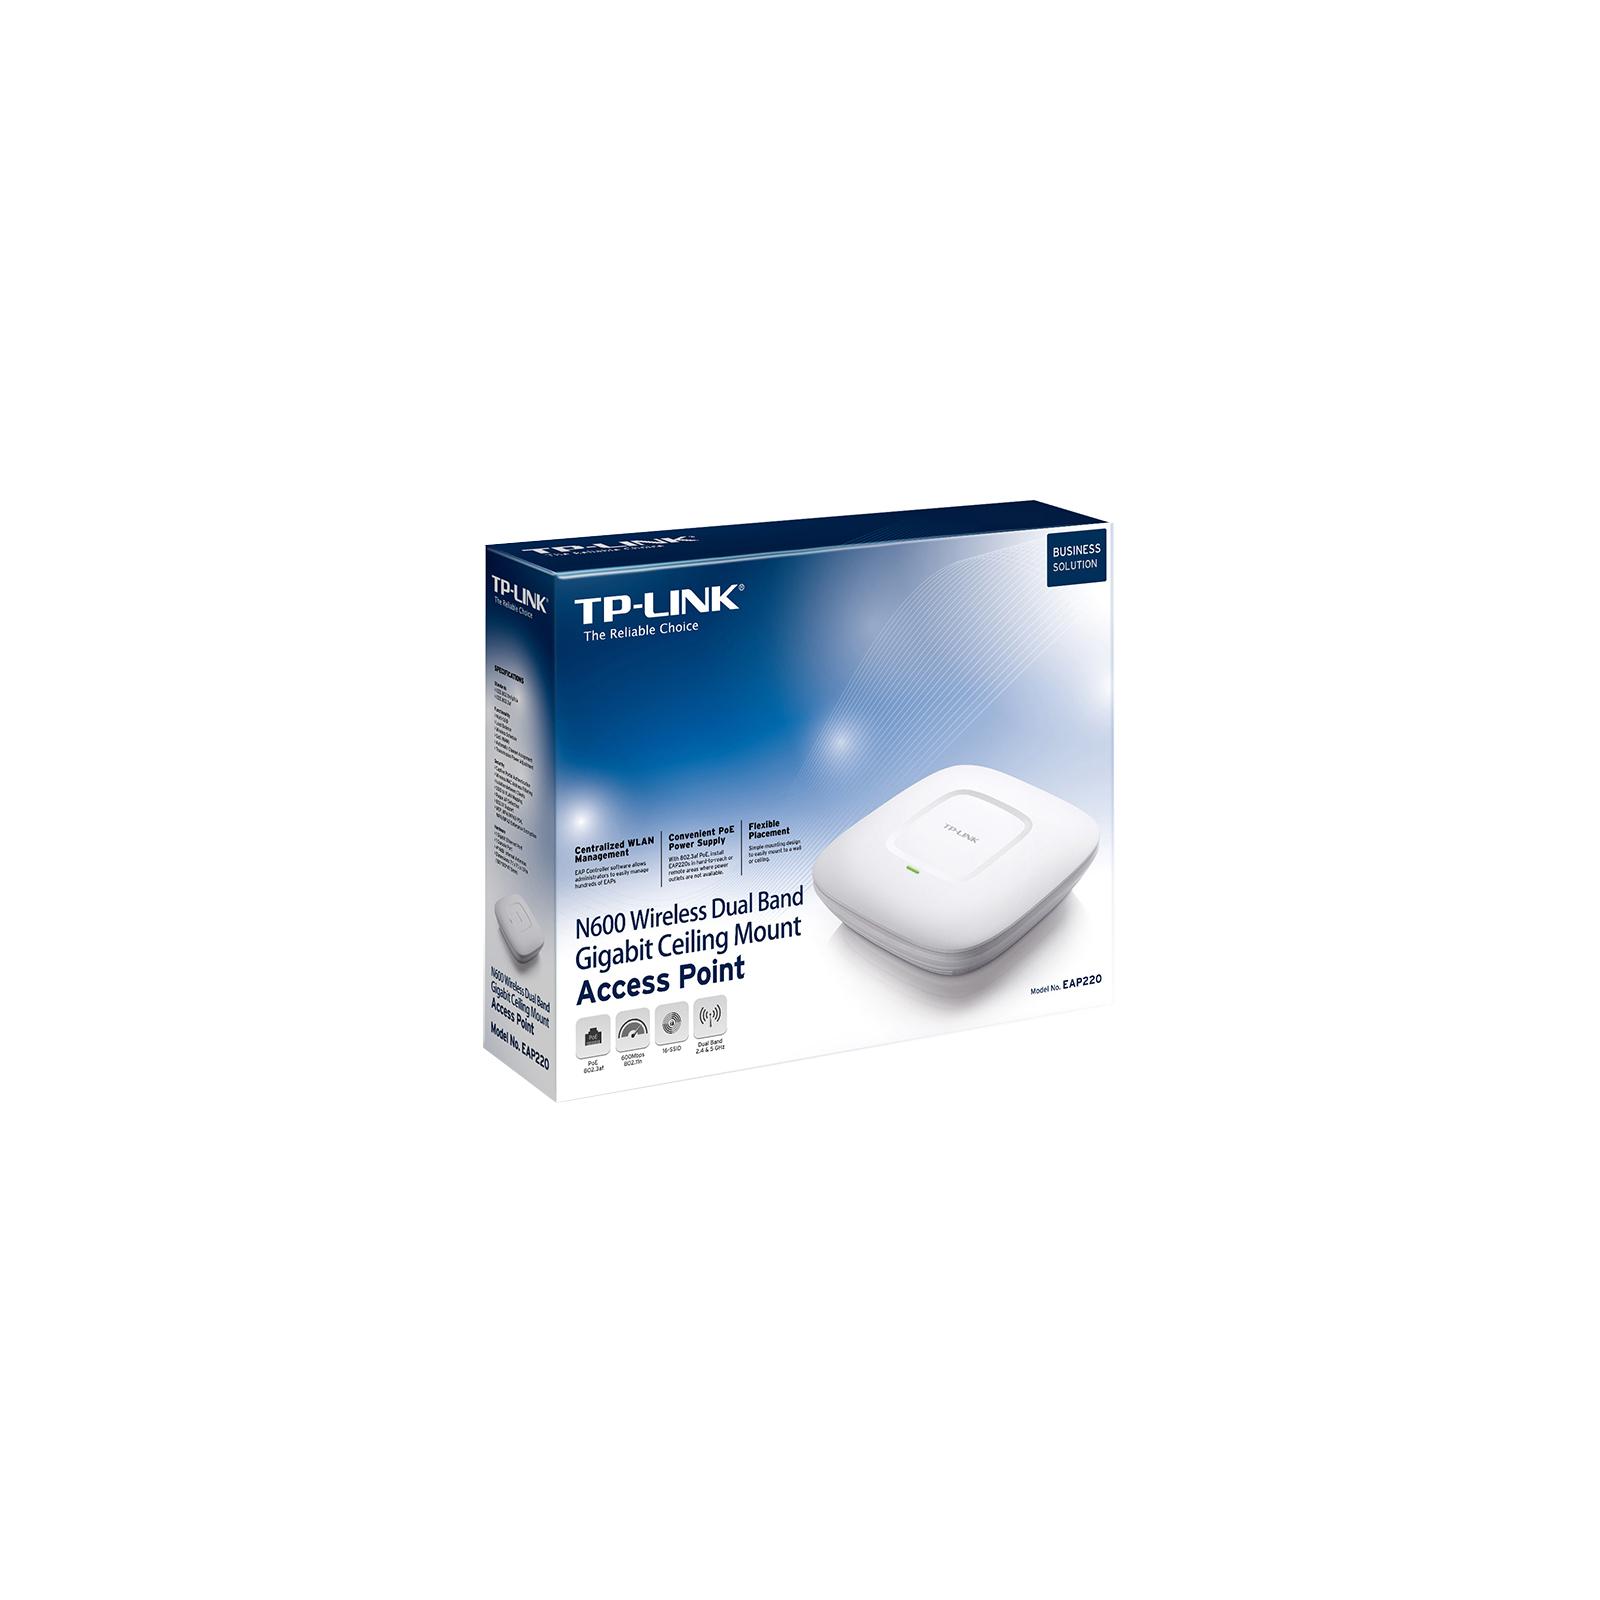 Точка доступа Wi-Fi TP-Link EAP220 изображение 5